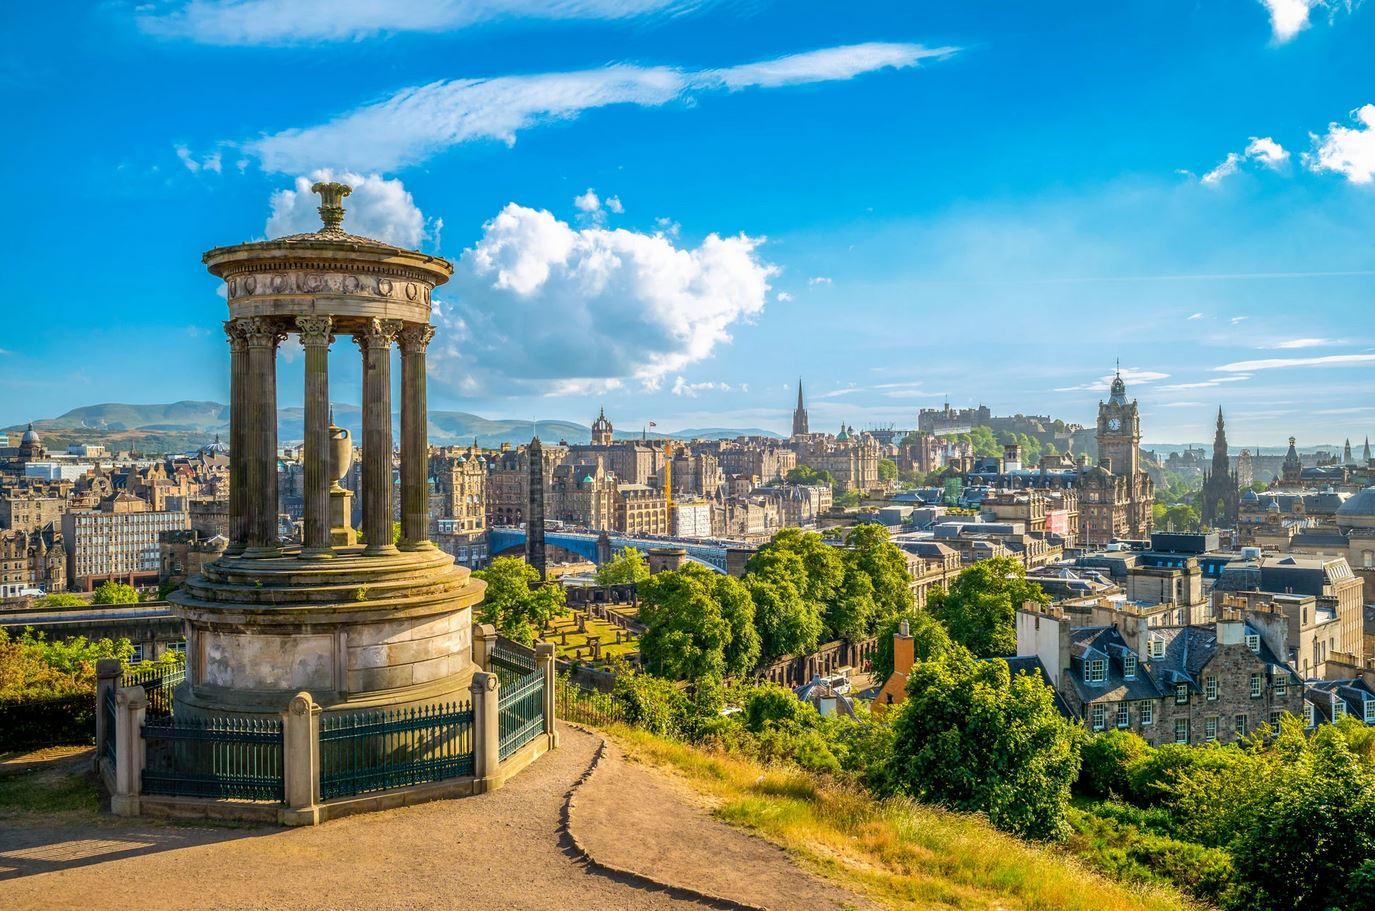 Despre Edinburgh (Scotia), cand sa mergi, perioade bune si atractii turistice